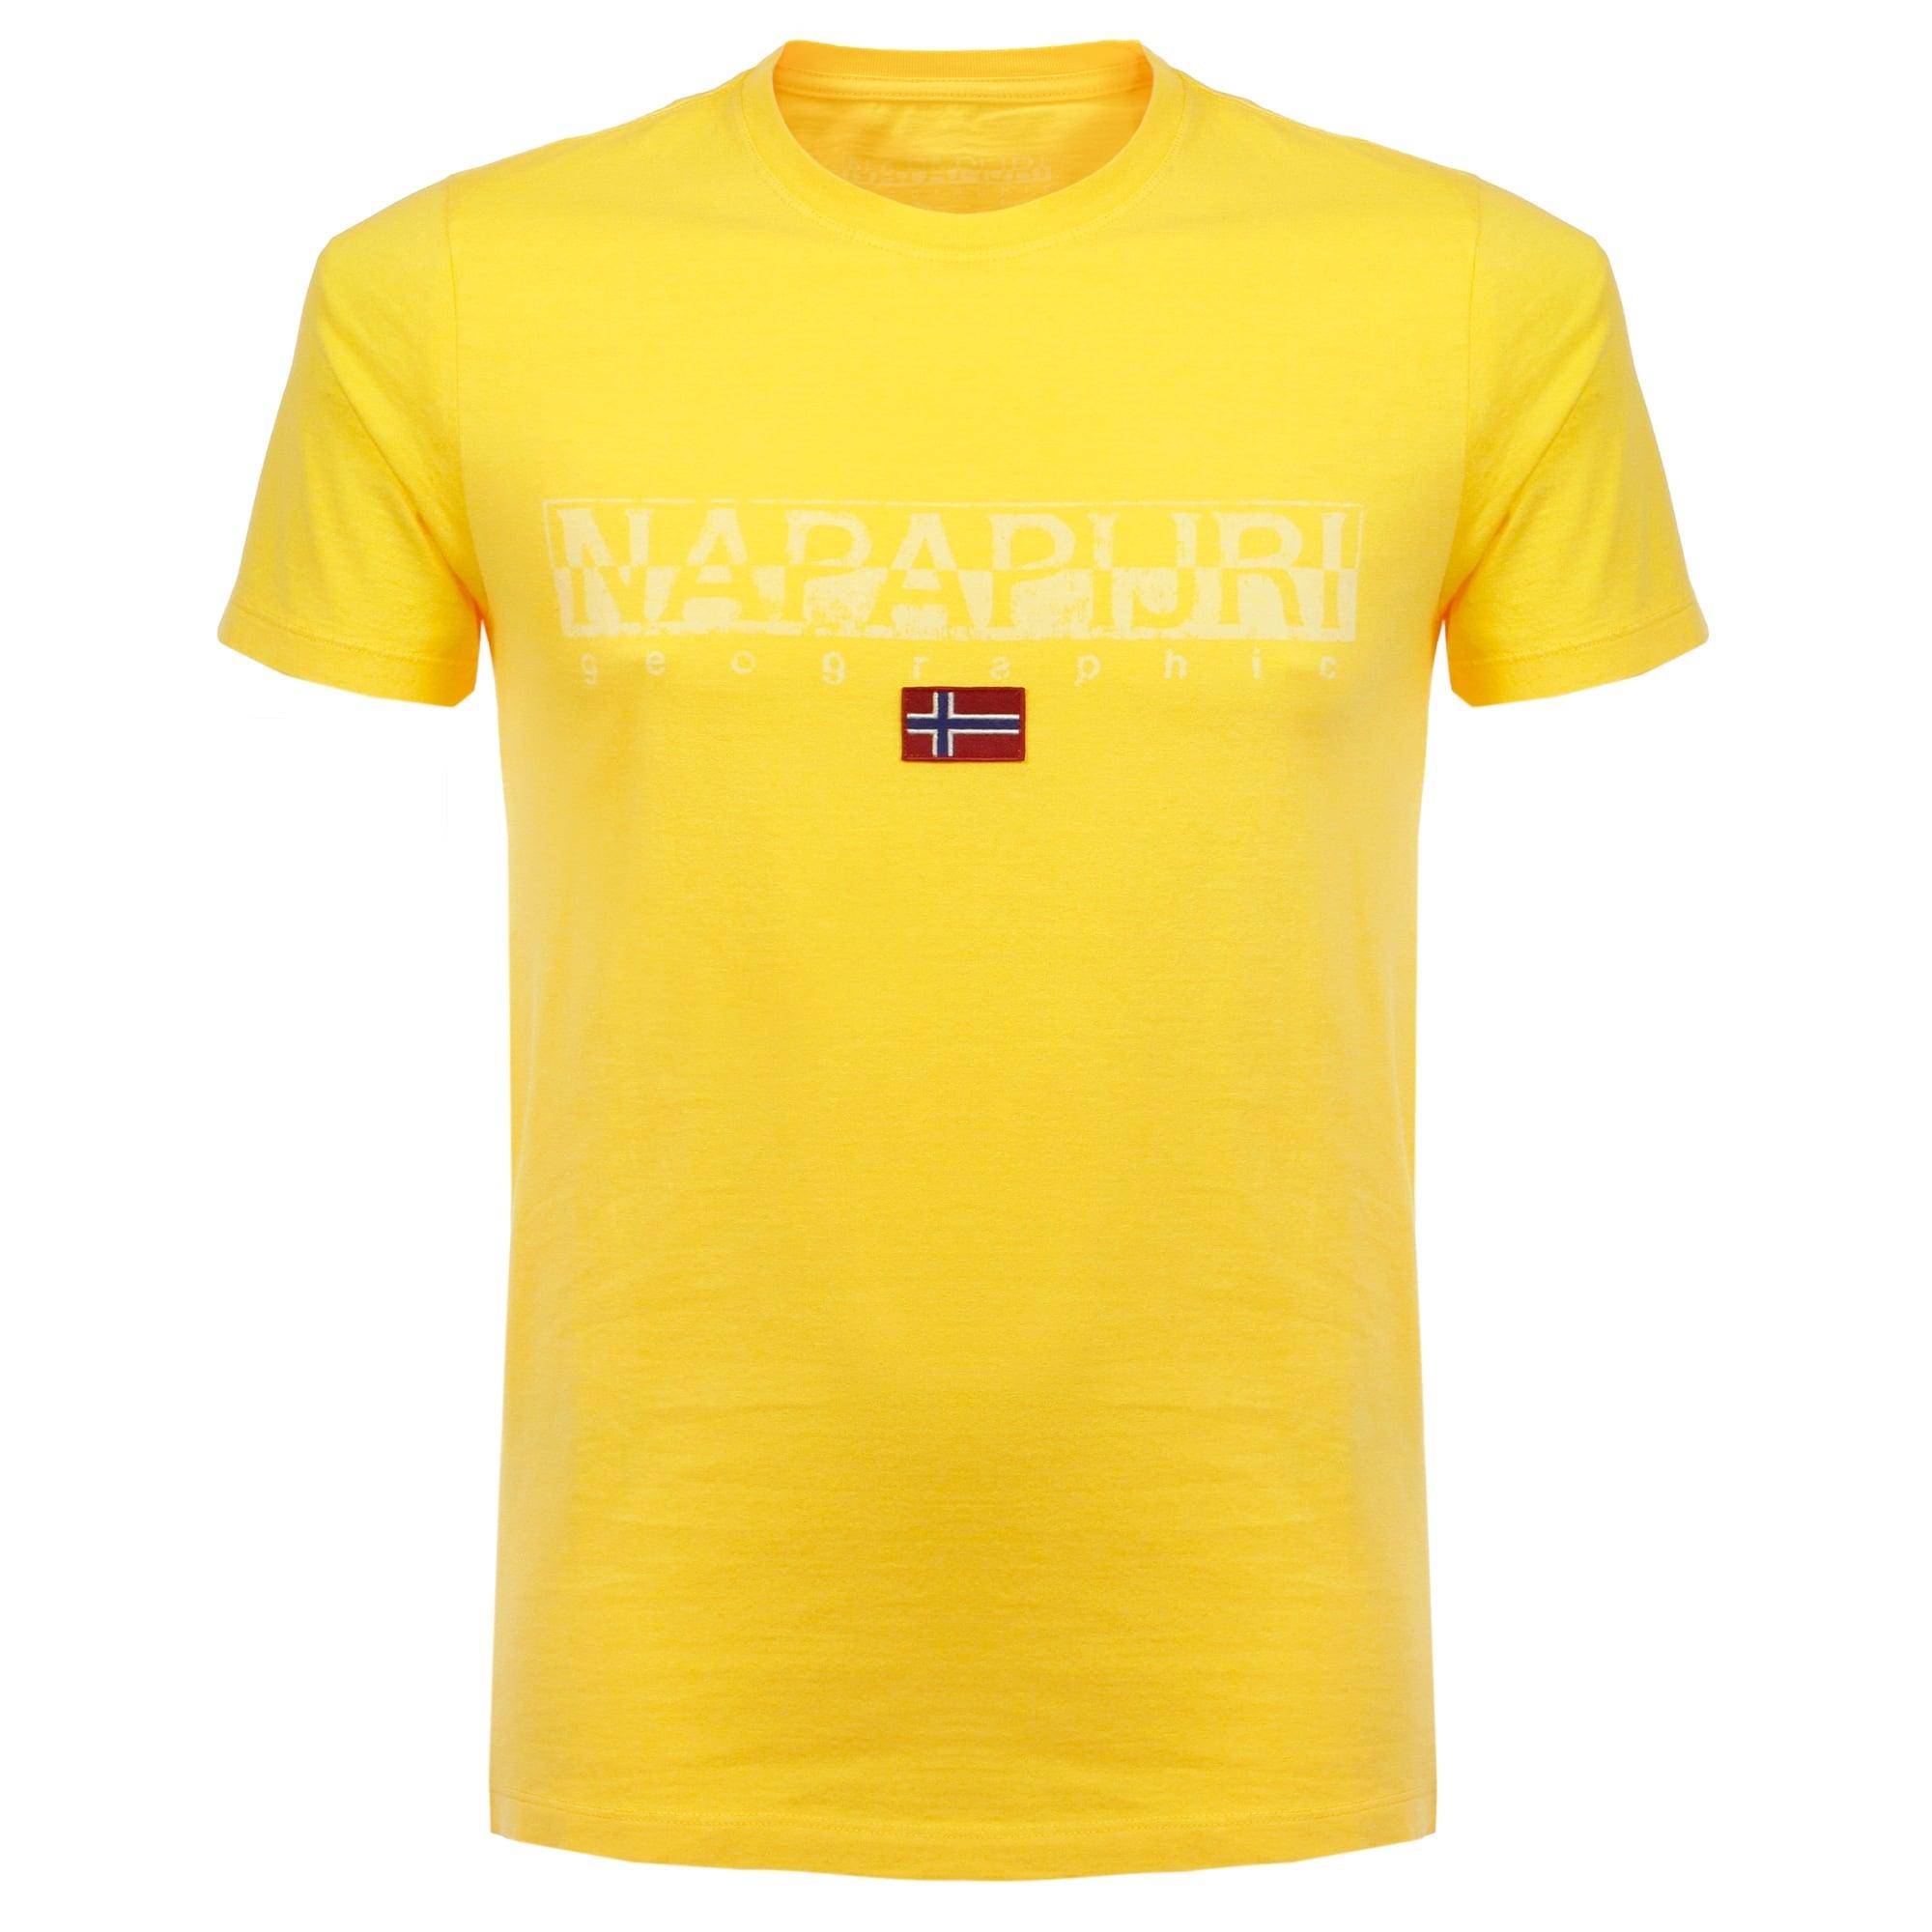 napapijri shop online sapriol summer yellow t shirt. Black Bedroom Furniture Sets. Home Design Ideas